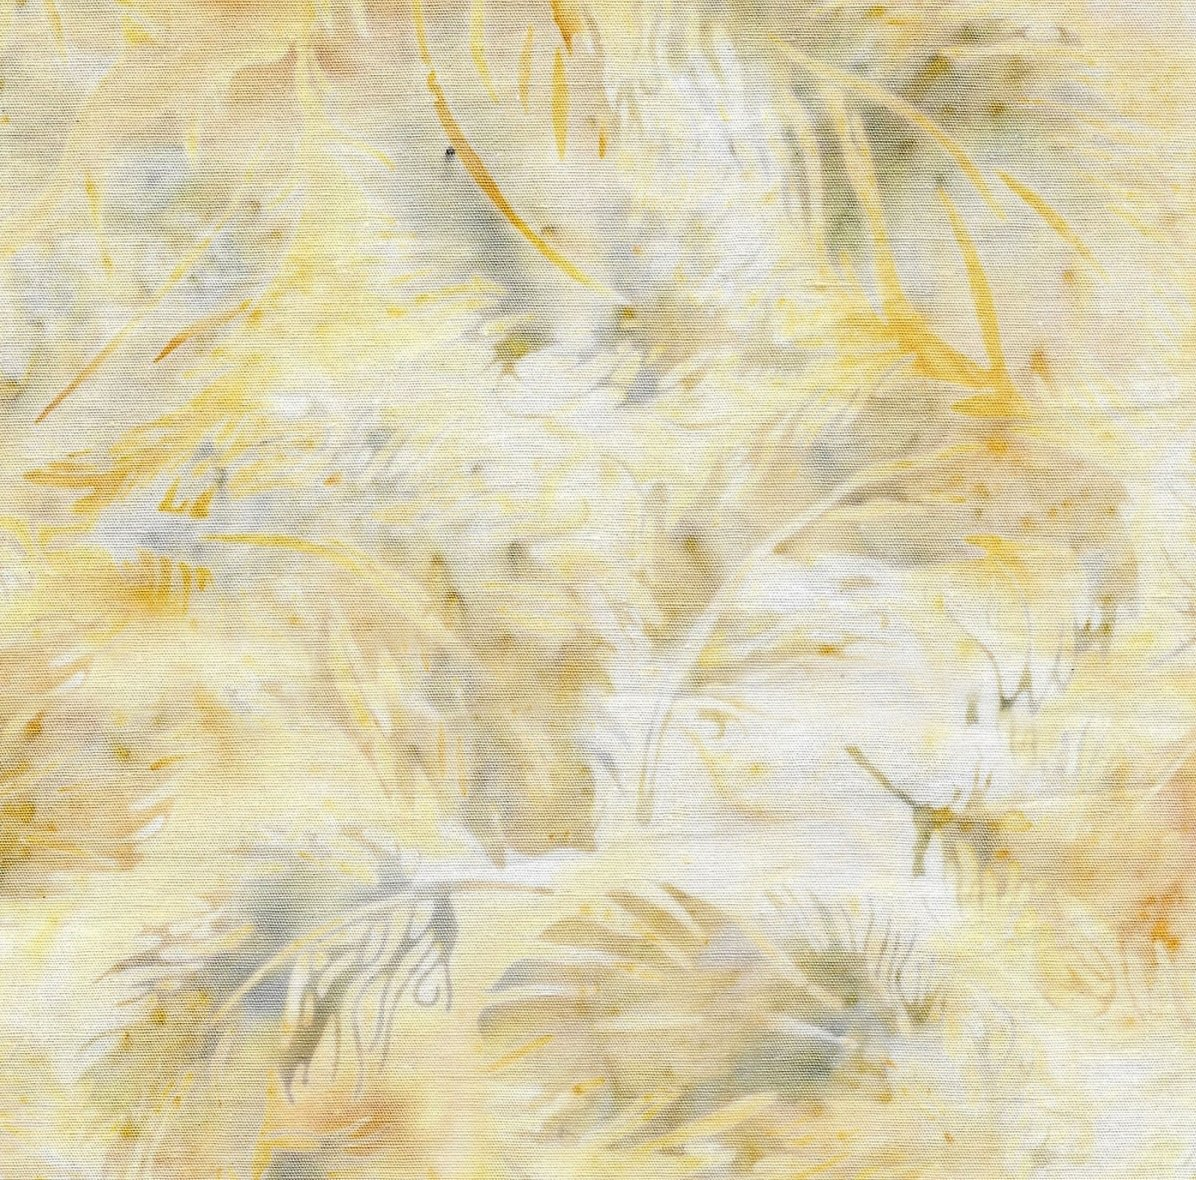 Island Batik Santa Fe Tossed Feather Hay